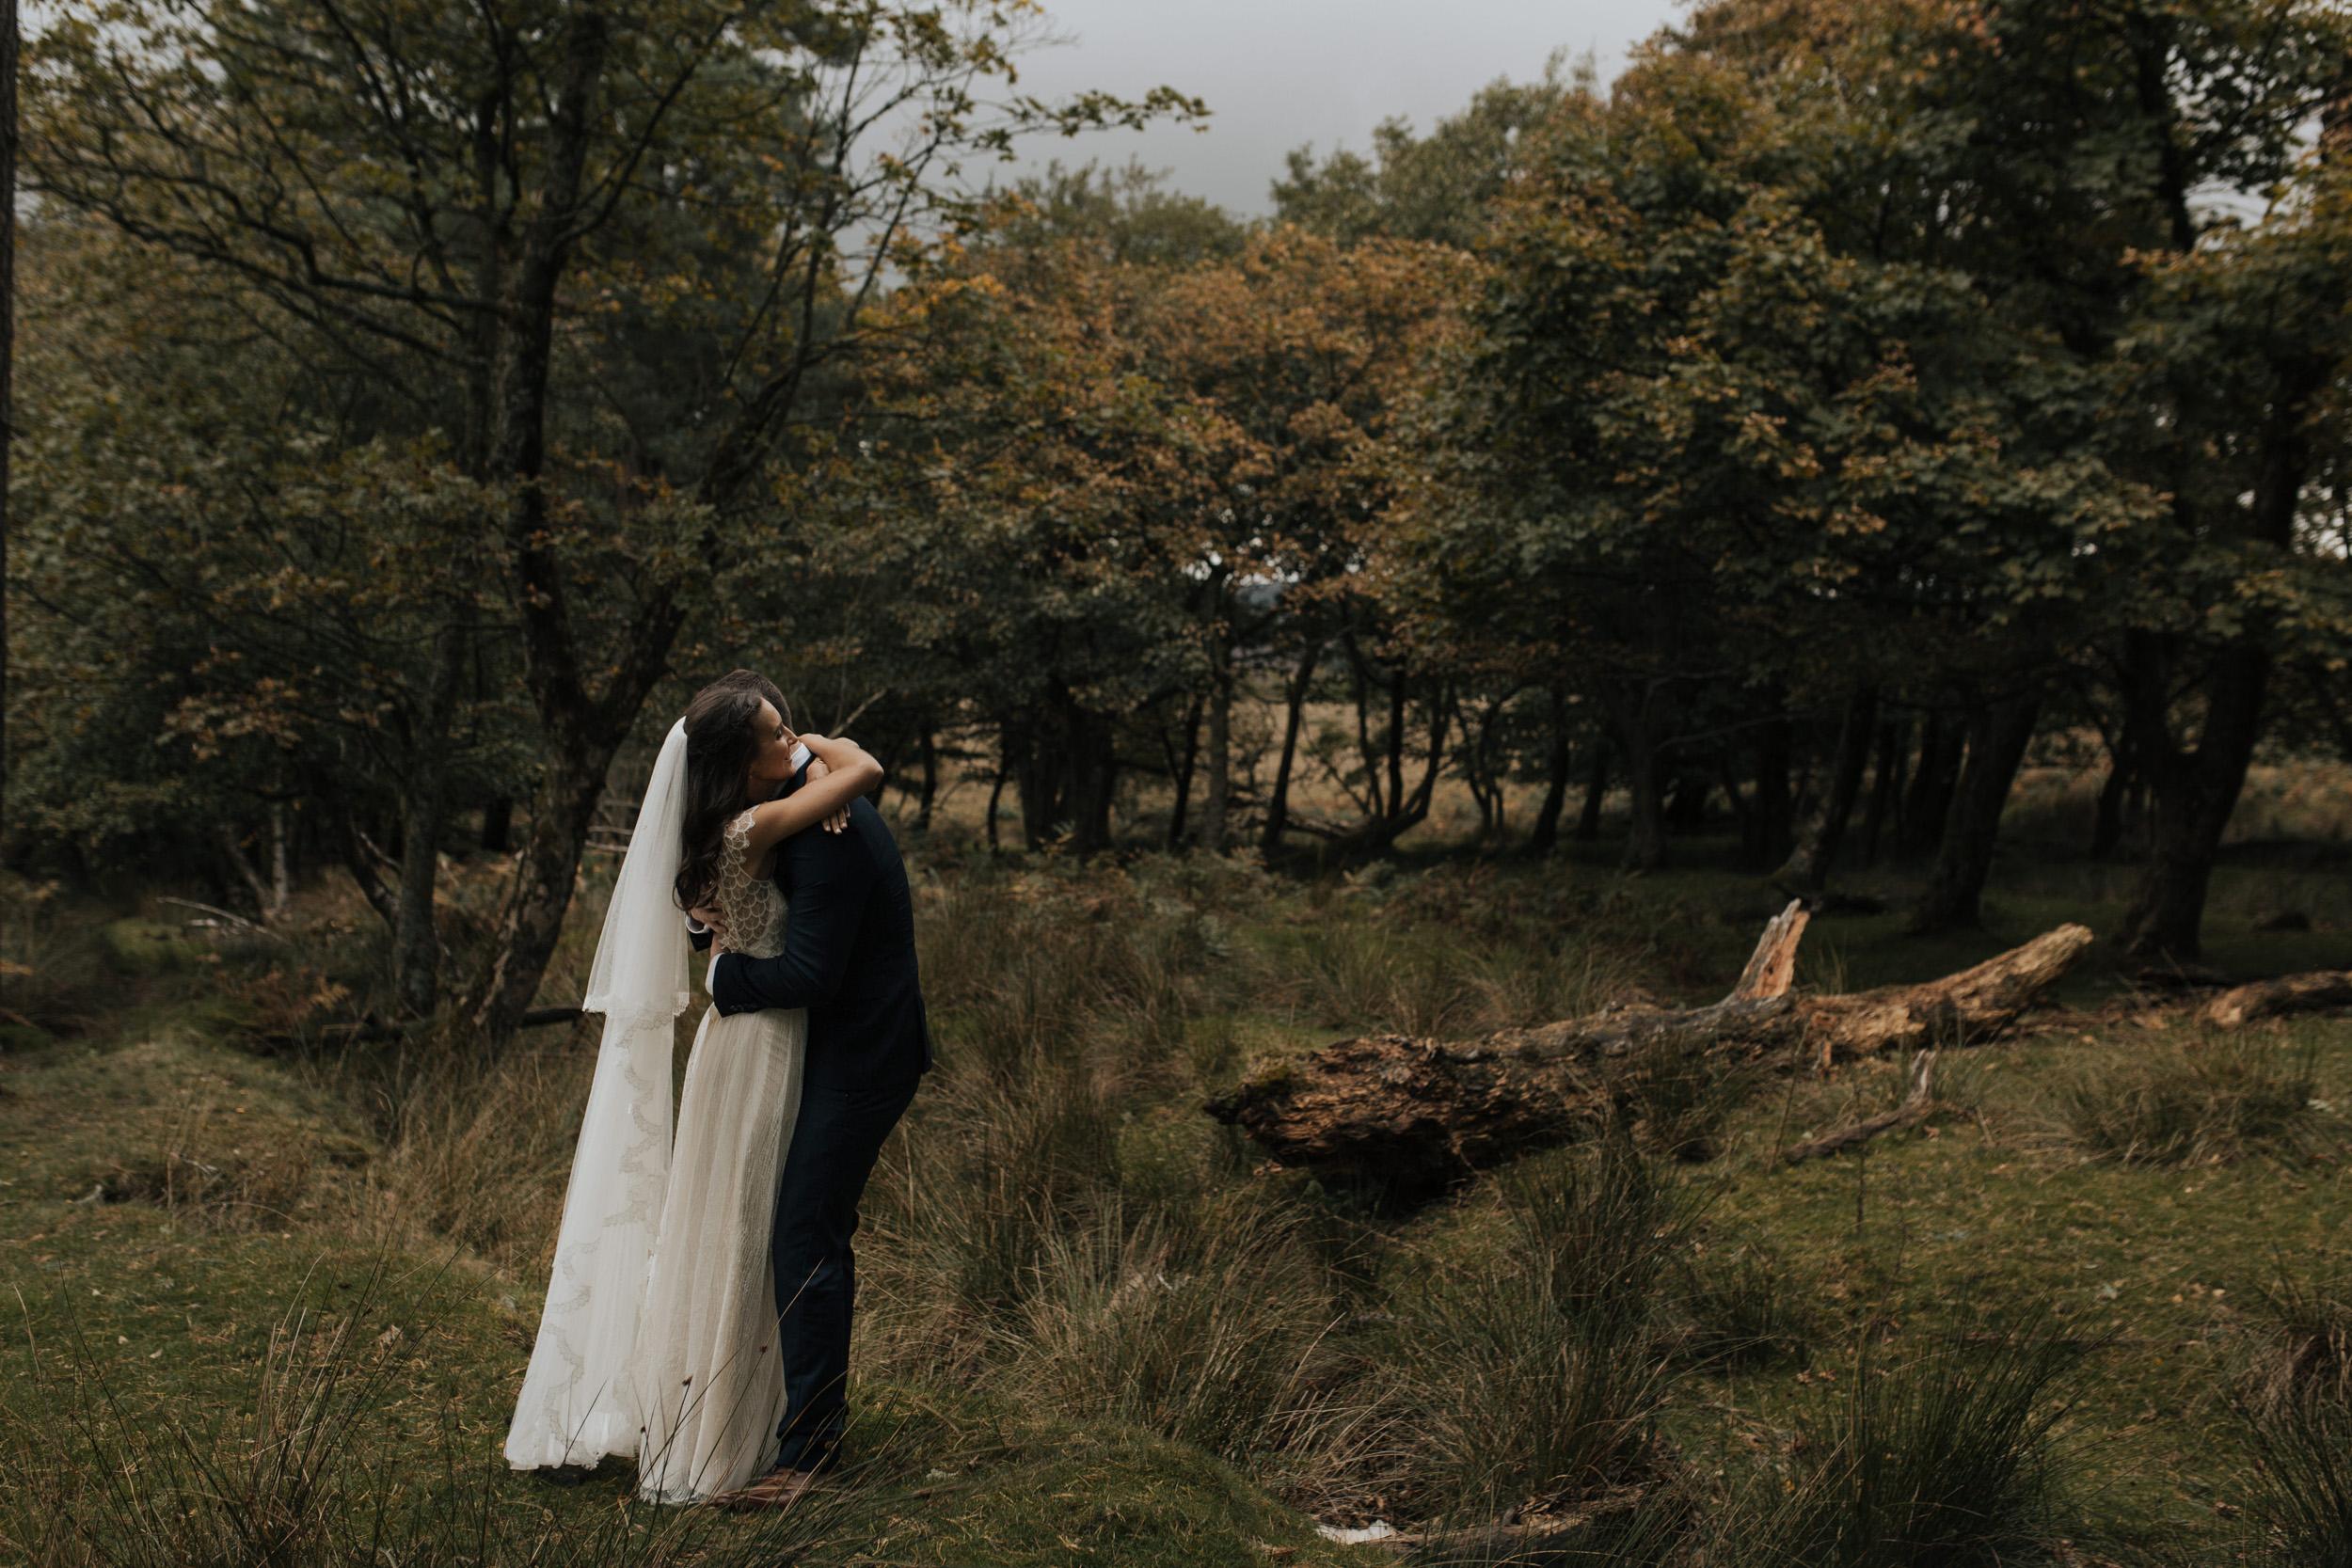 Joasia-Kate-Beaumont-Bohemian-Lace-Wedding-Dress-Peak-District-Sheffield-Wedding-28.jpg